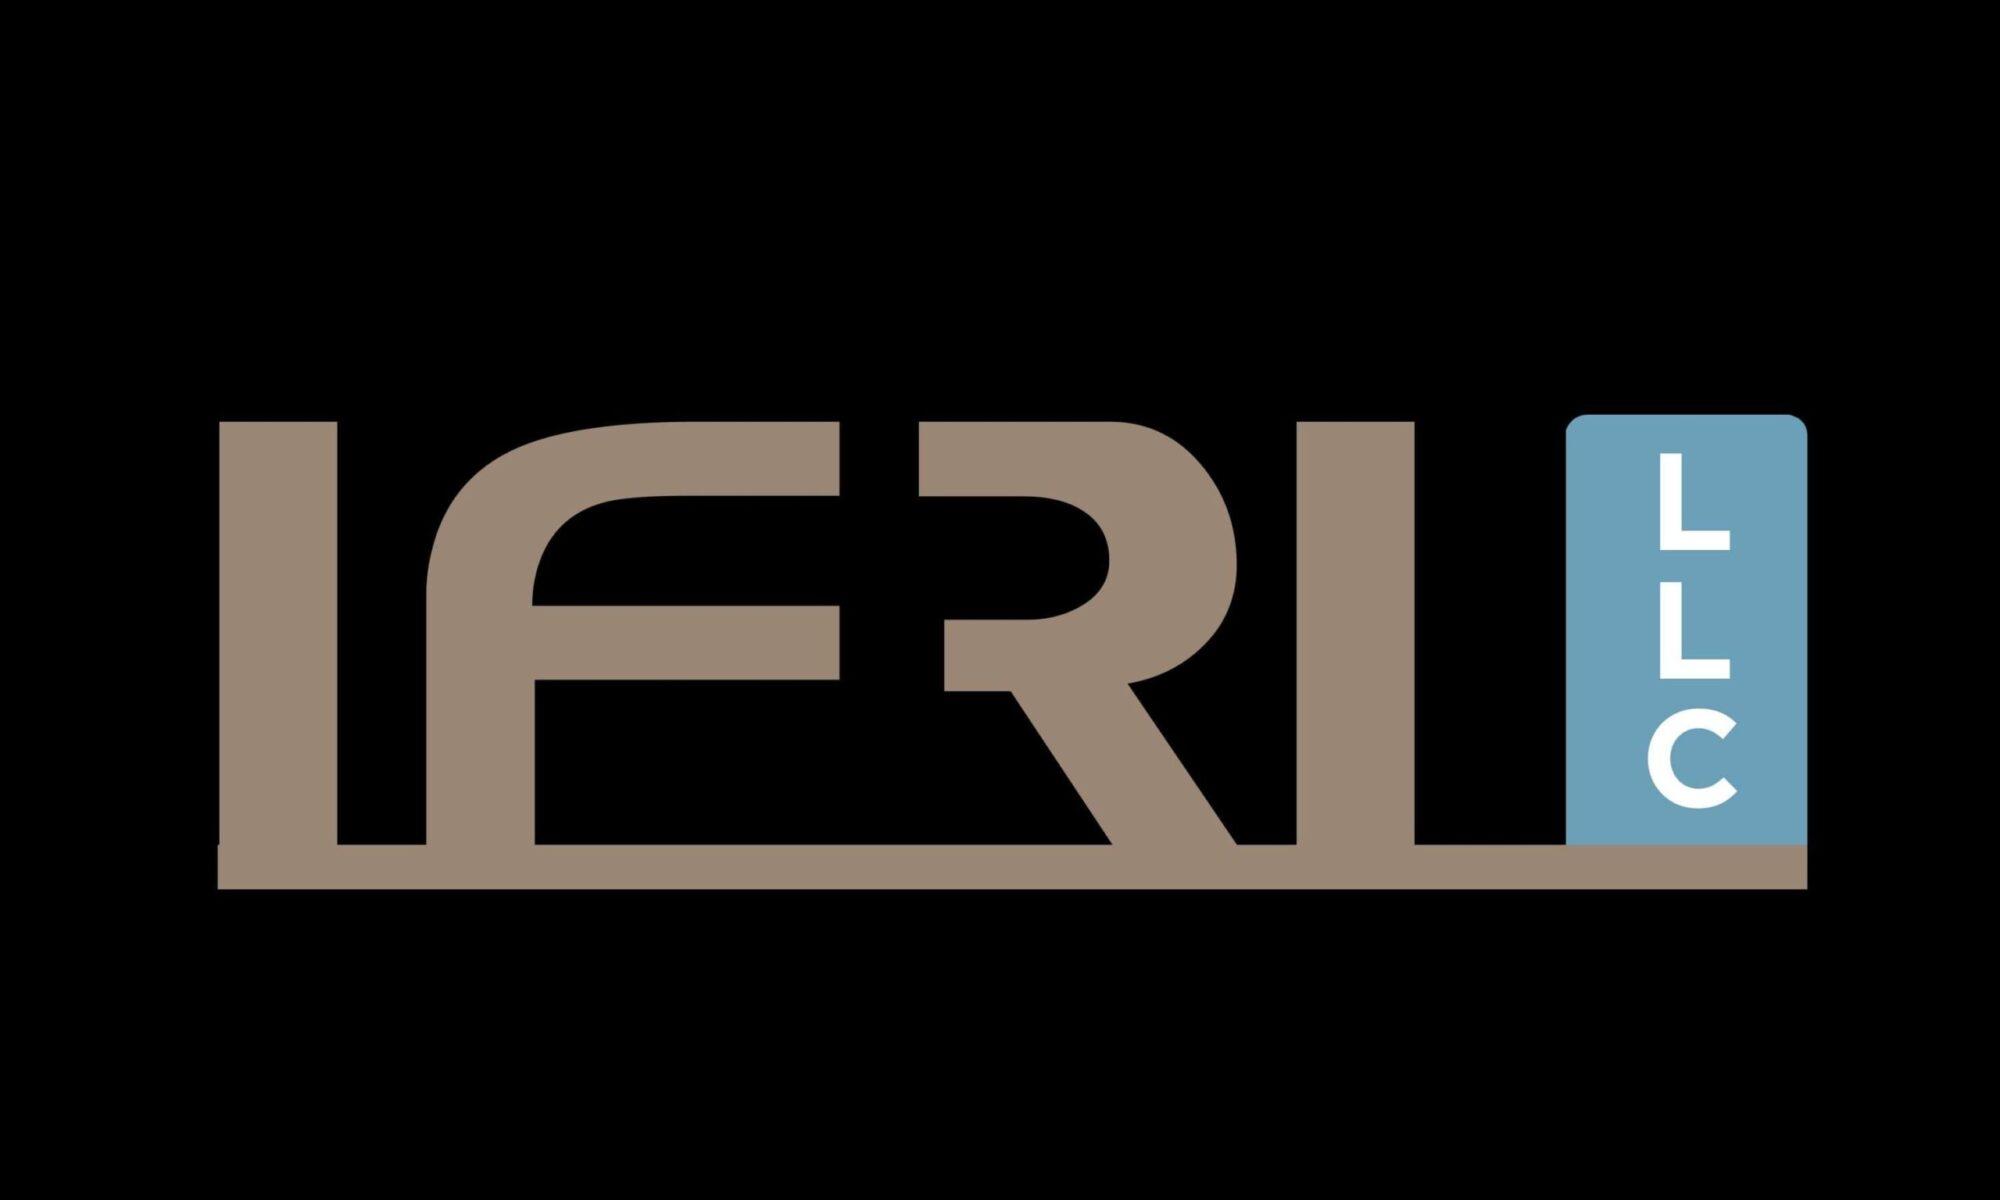 IFRI LLC